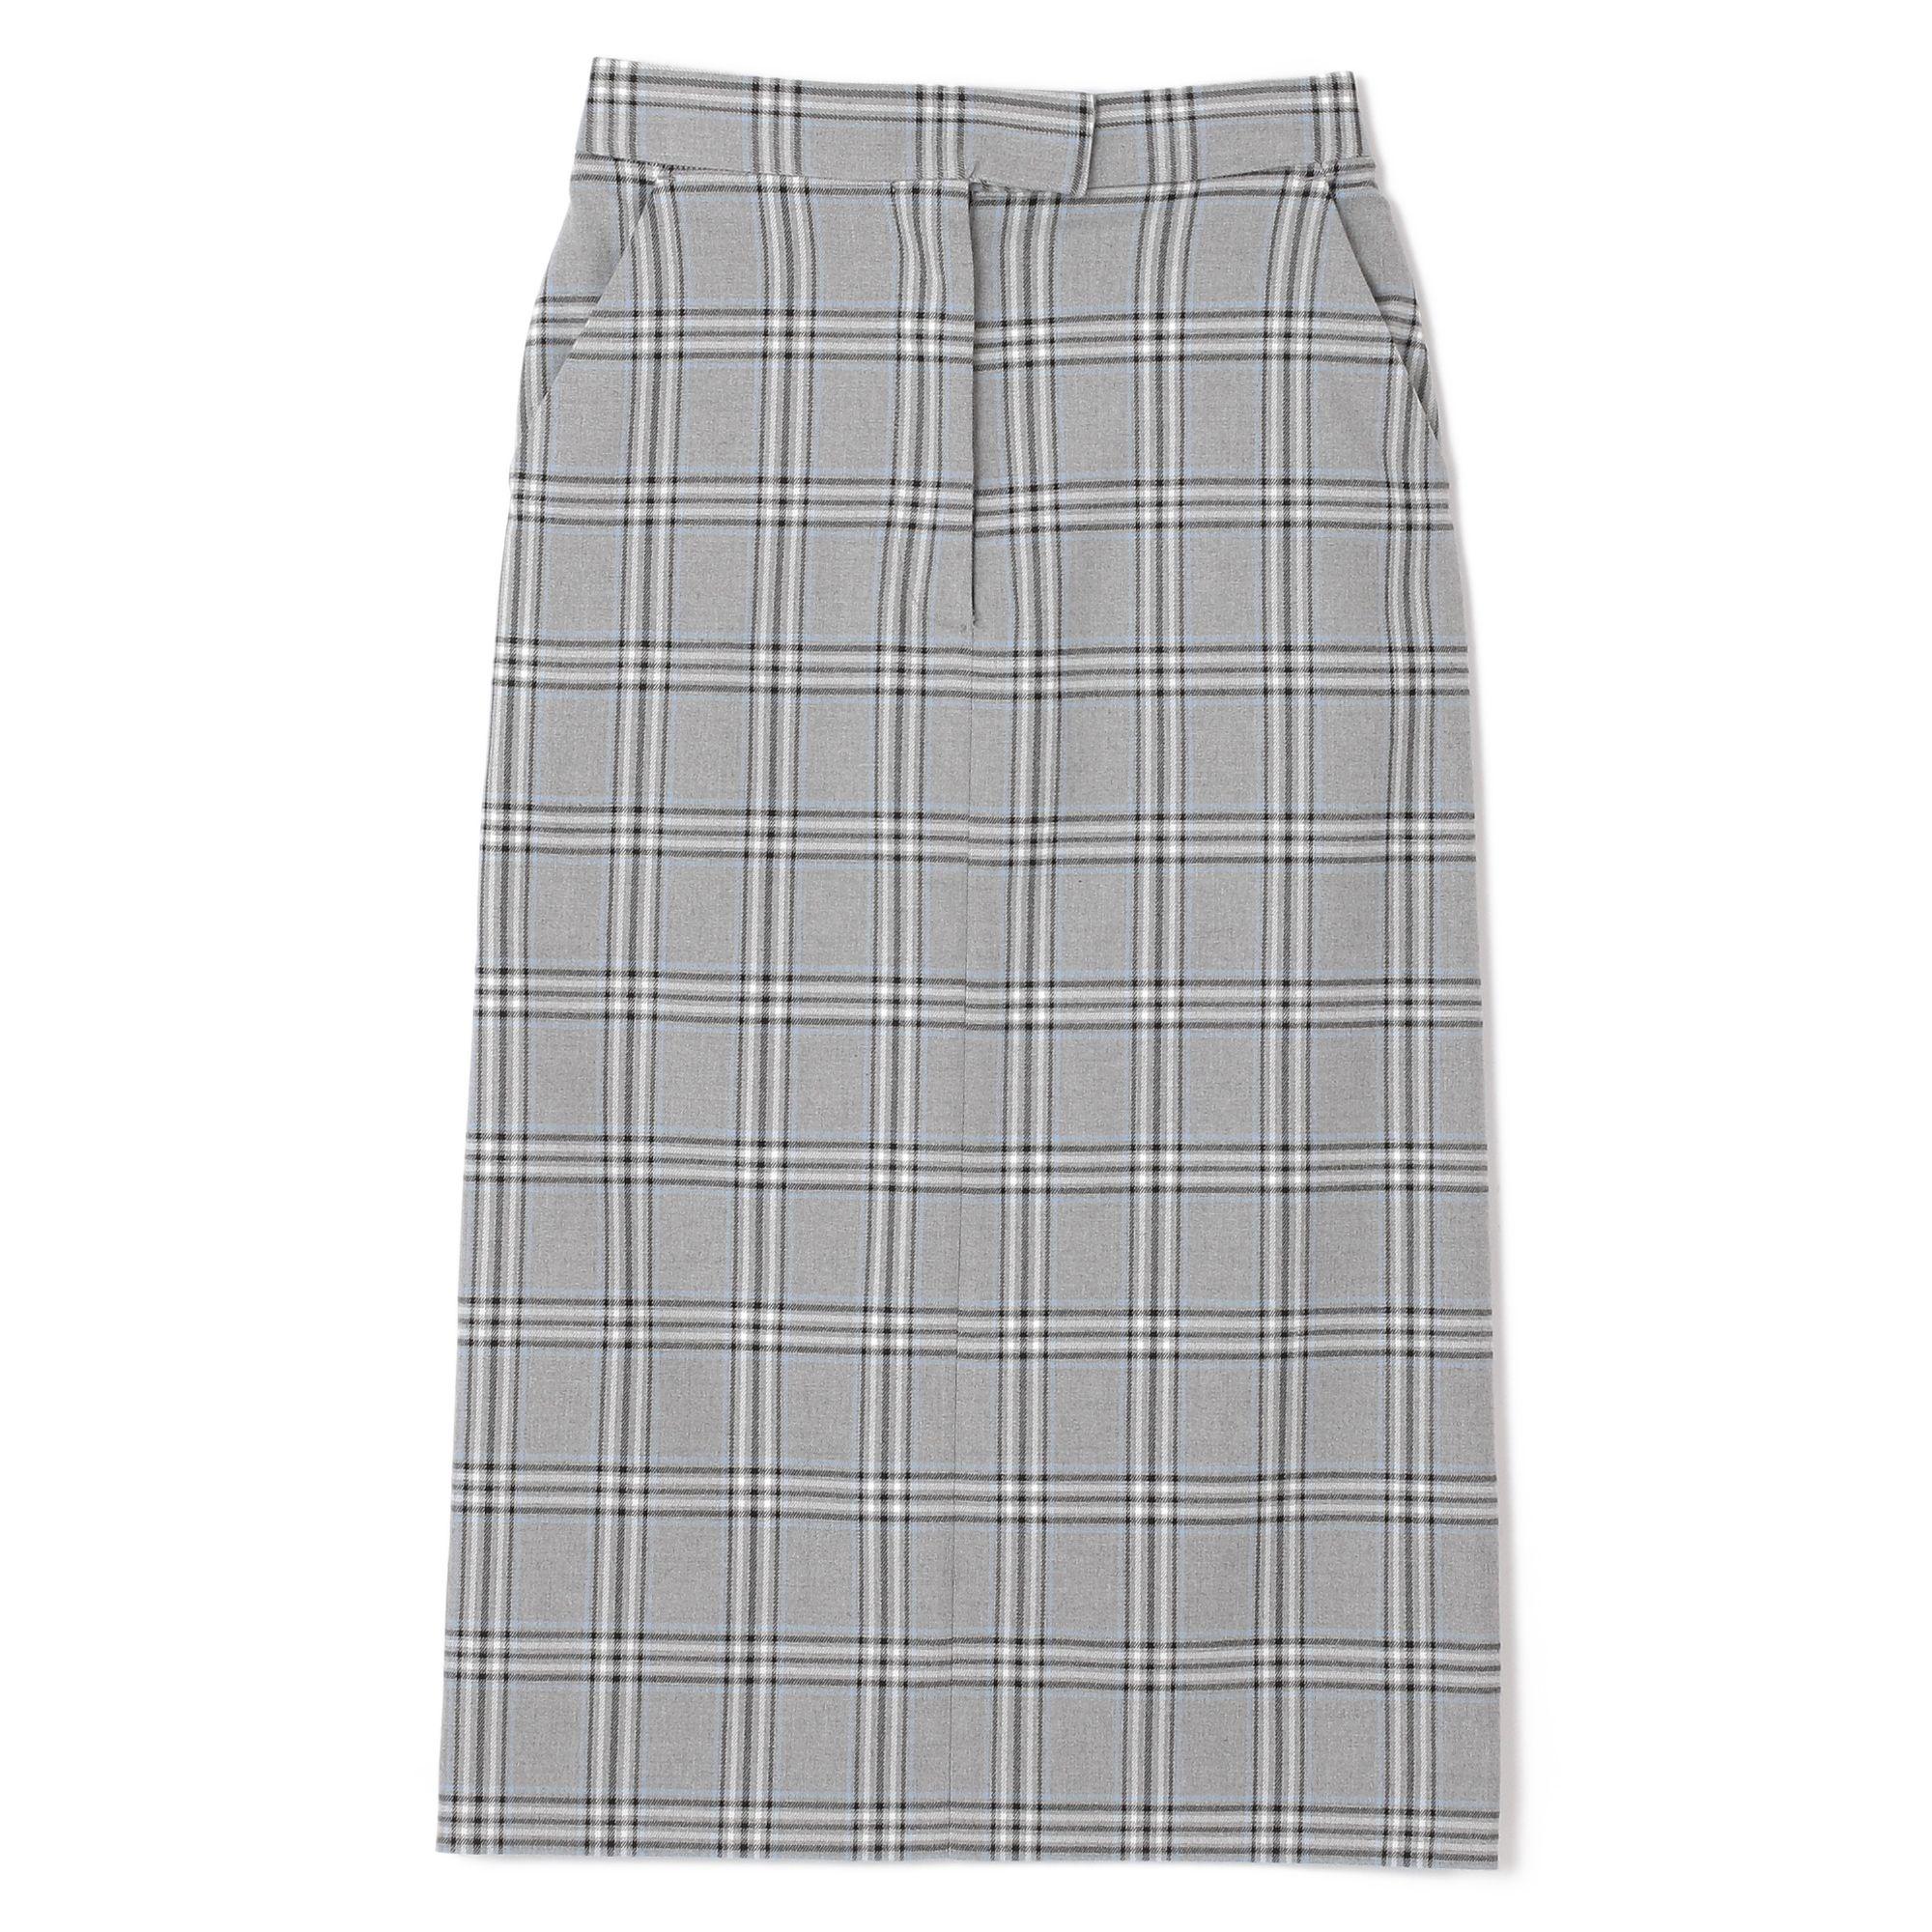 Mila Owenミラ オーウェン/チェックタイトスカート